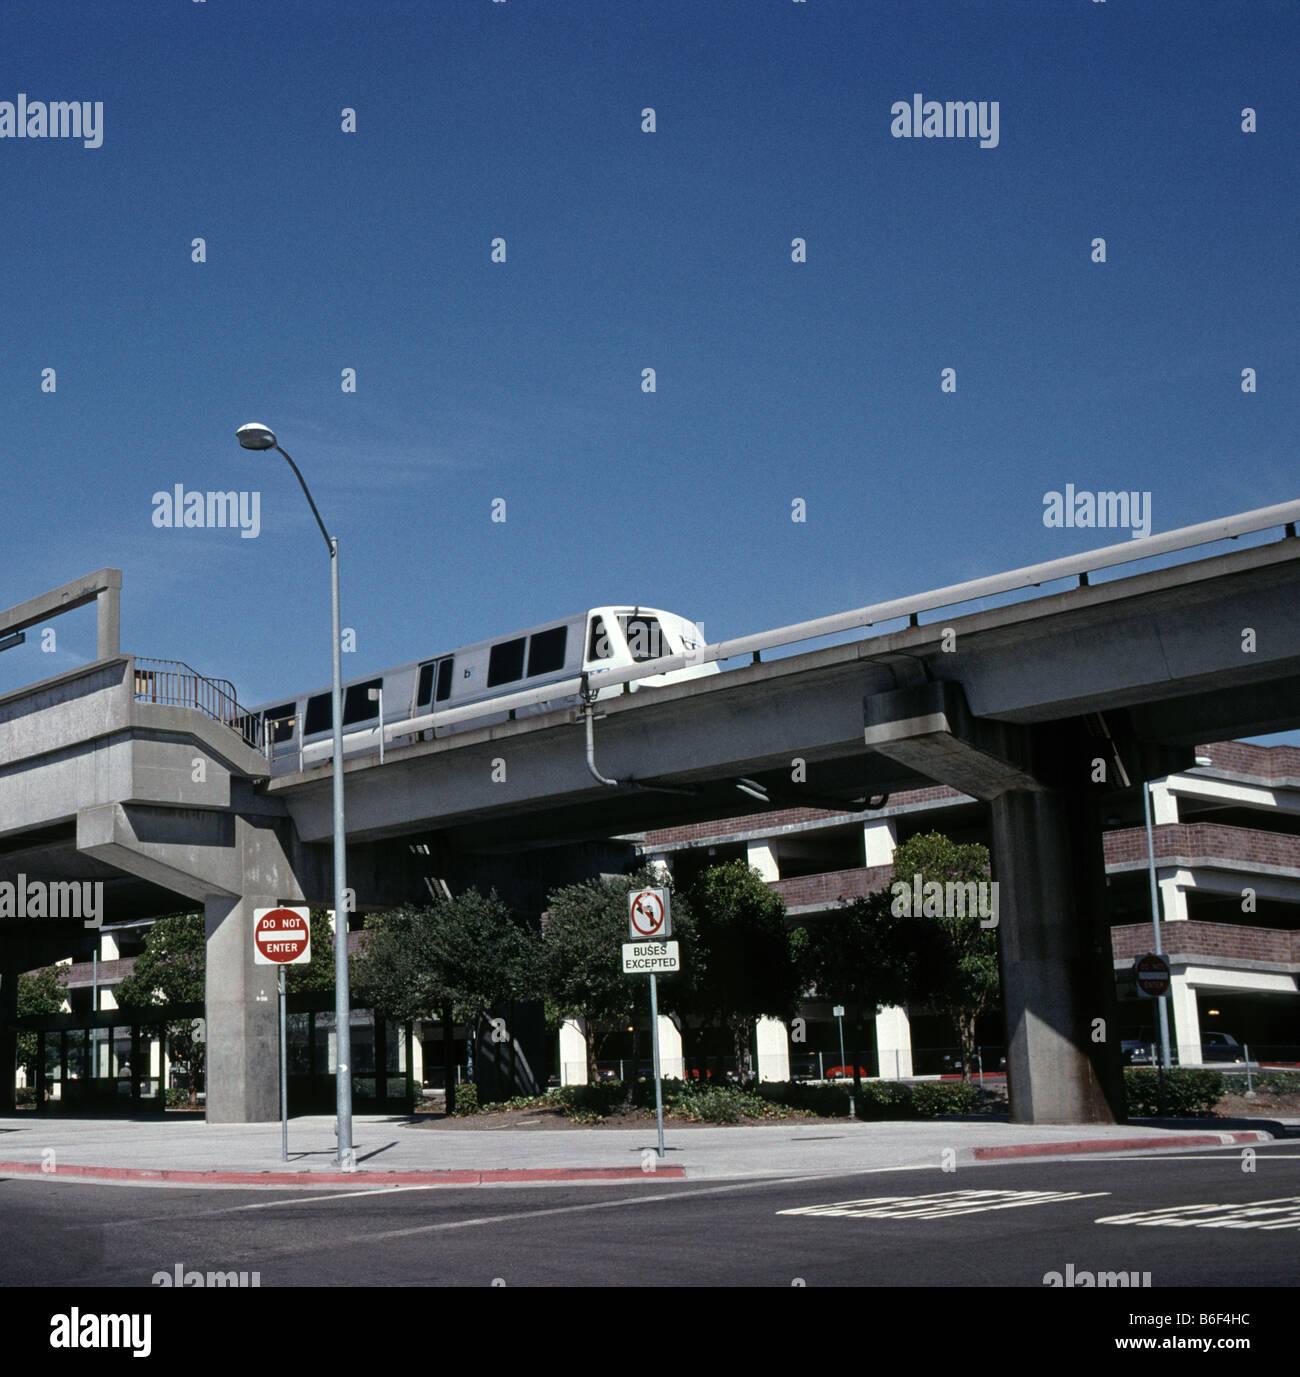 BART Bay Area Rapid Transit San Francisco Bay area California USA - Stock Image